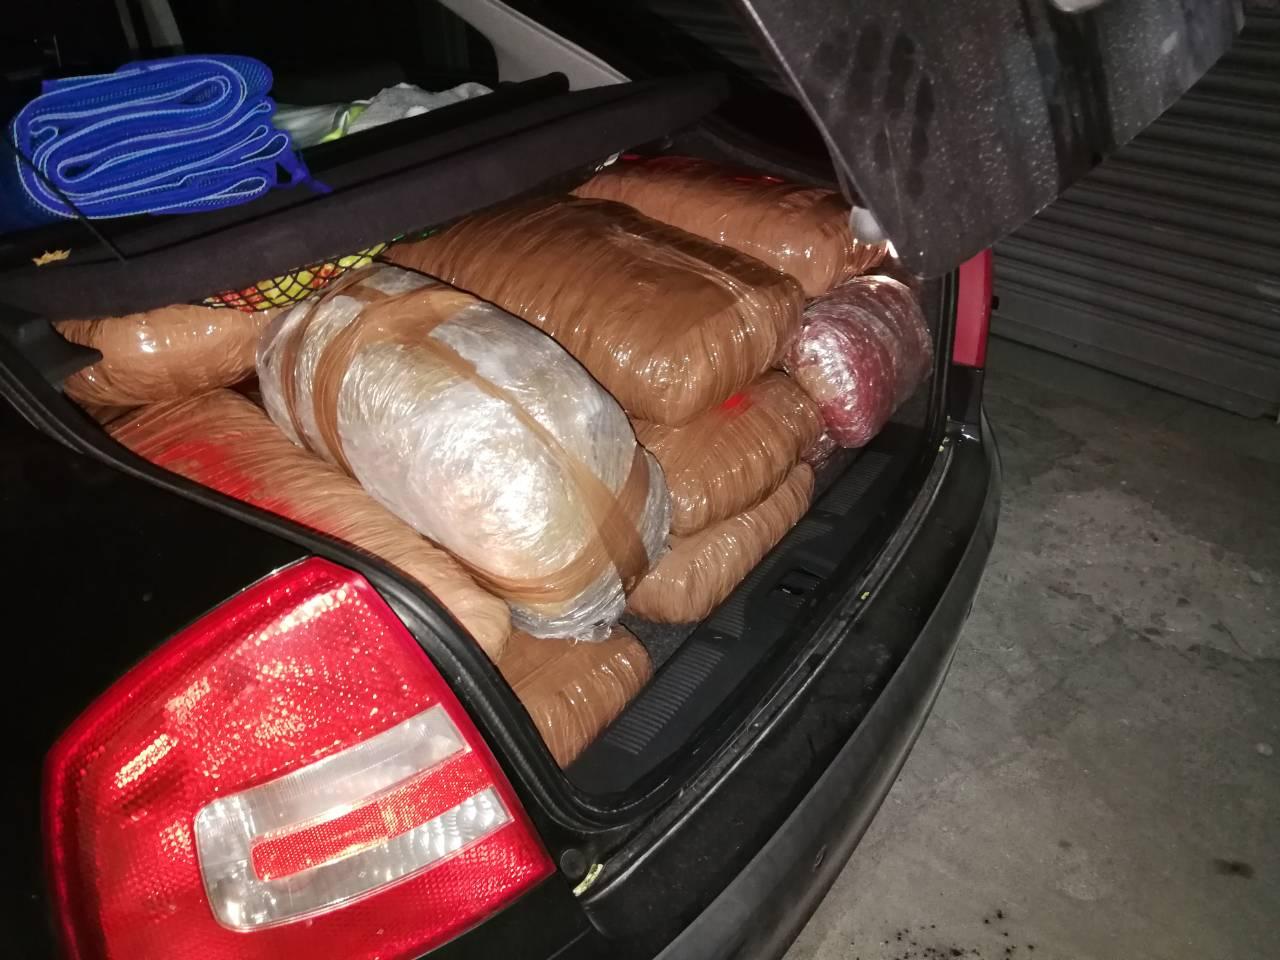 Kλεμμένο και  εγκαταλελειμμένο  Ι.Χ.Ε. στη Νέα Σελεύκεια Θεσπρωτίας με  144 kg κάνναβης